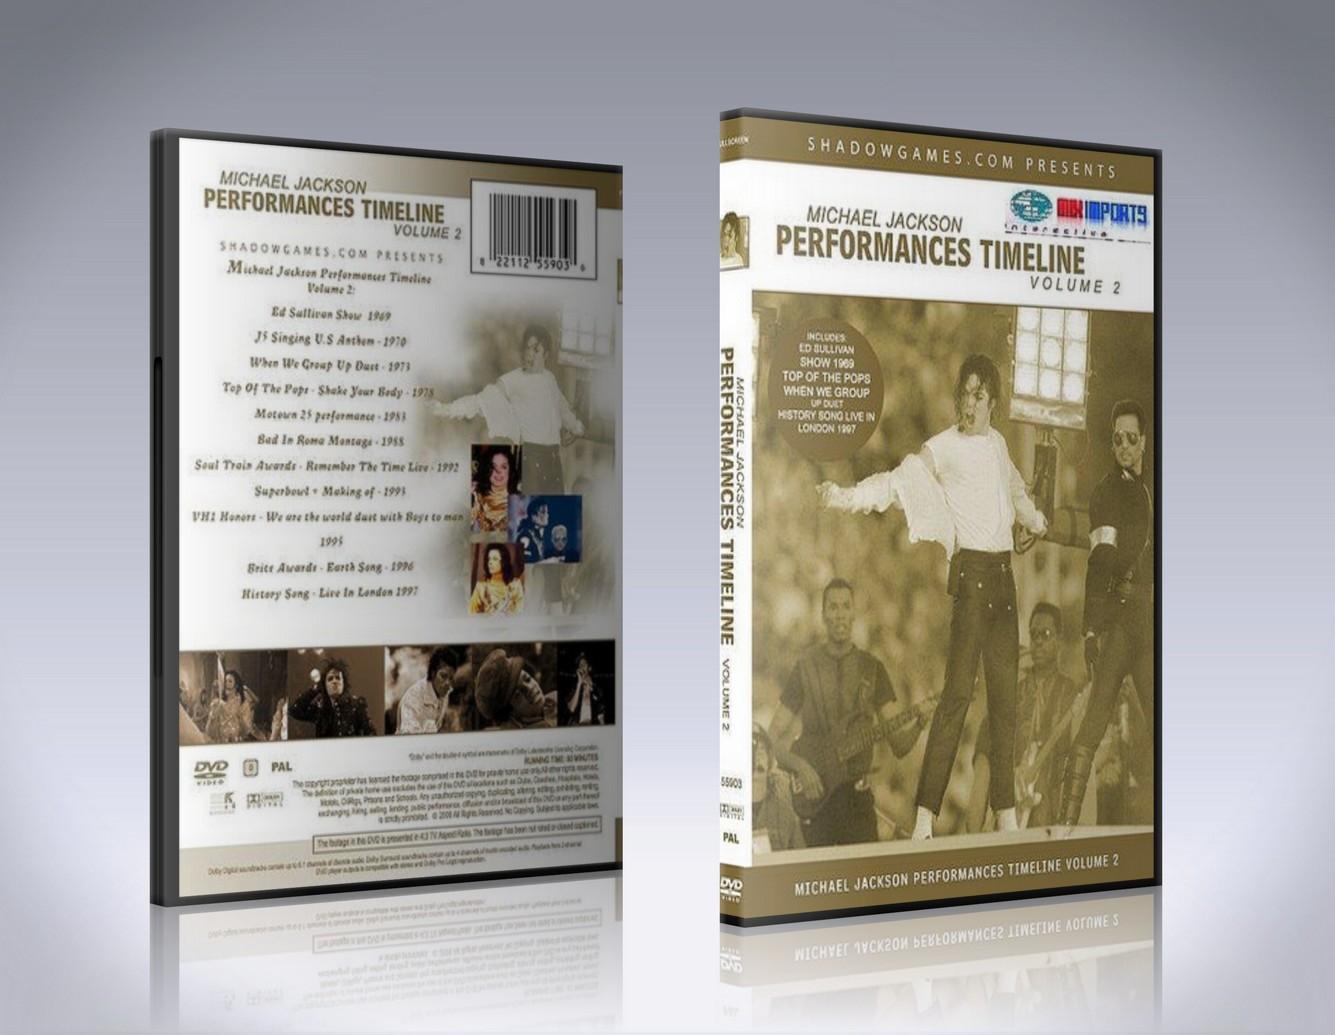 http://1.bp.blogspot.com/-fnxXCNWqtoA/UJP-1zkkWJI/AAAAAAAAHqk/JWXX6acST9s/s1600/DVD+Show+Michael+Jackson+-+Performances+Timeline+Vol.2.jpg